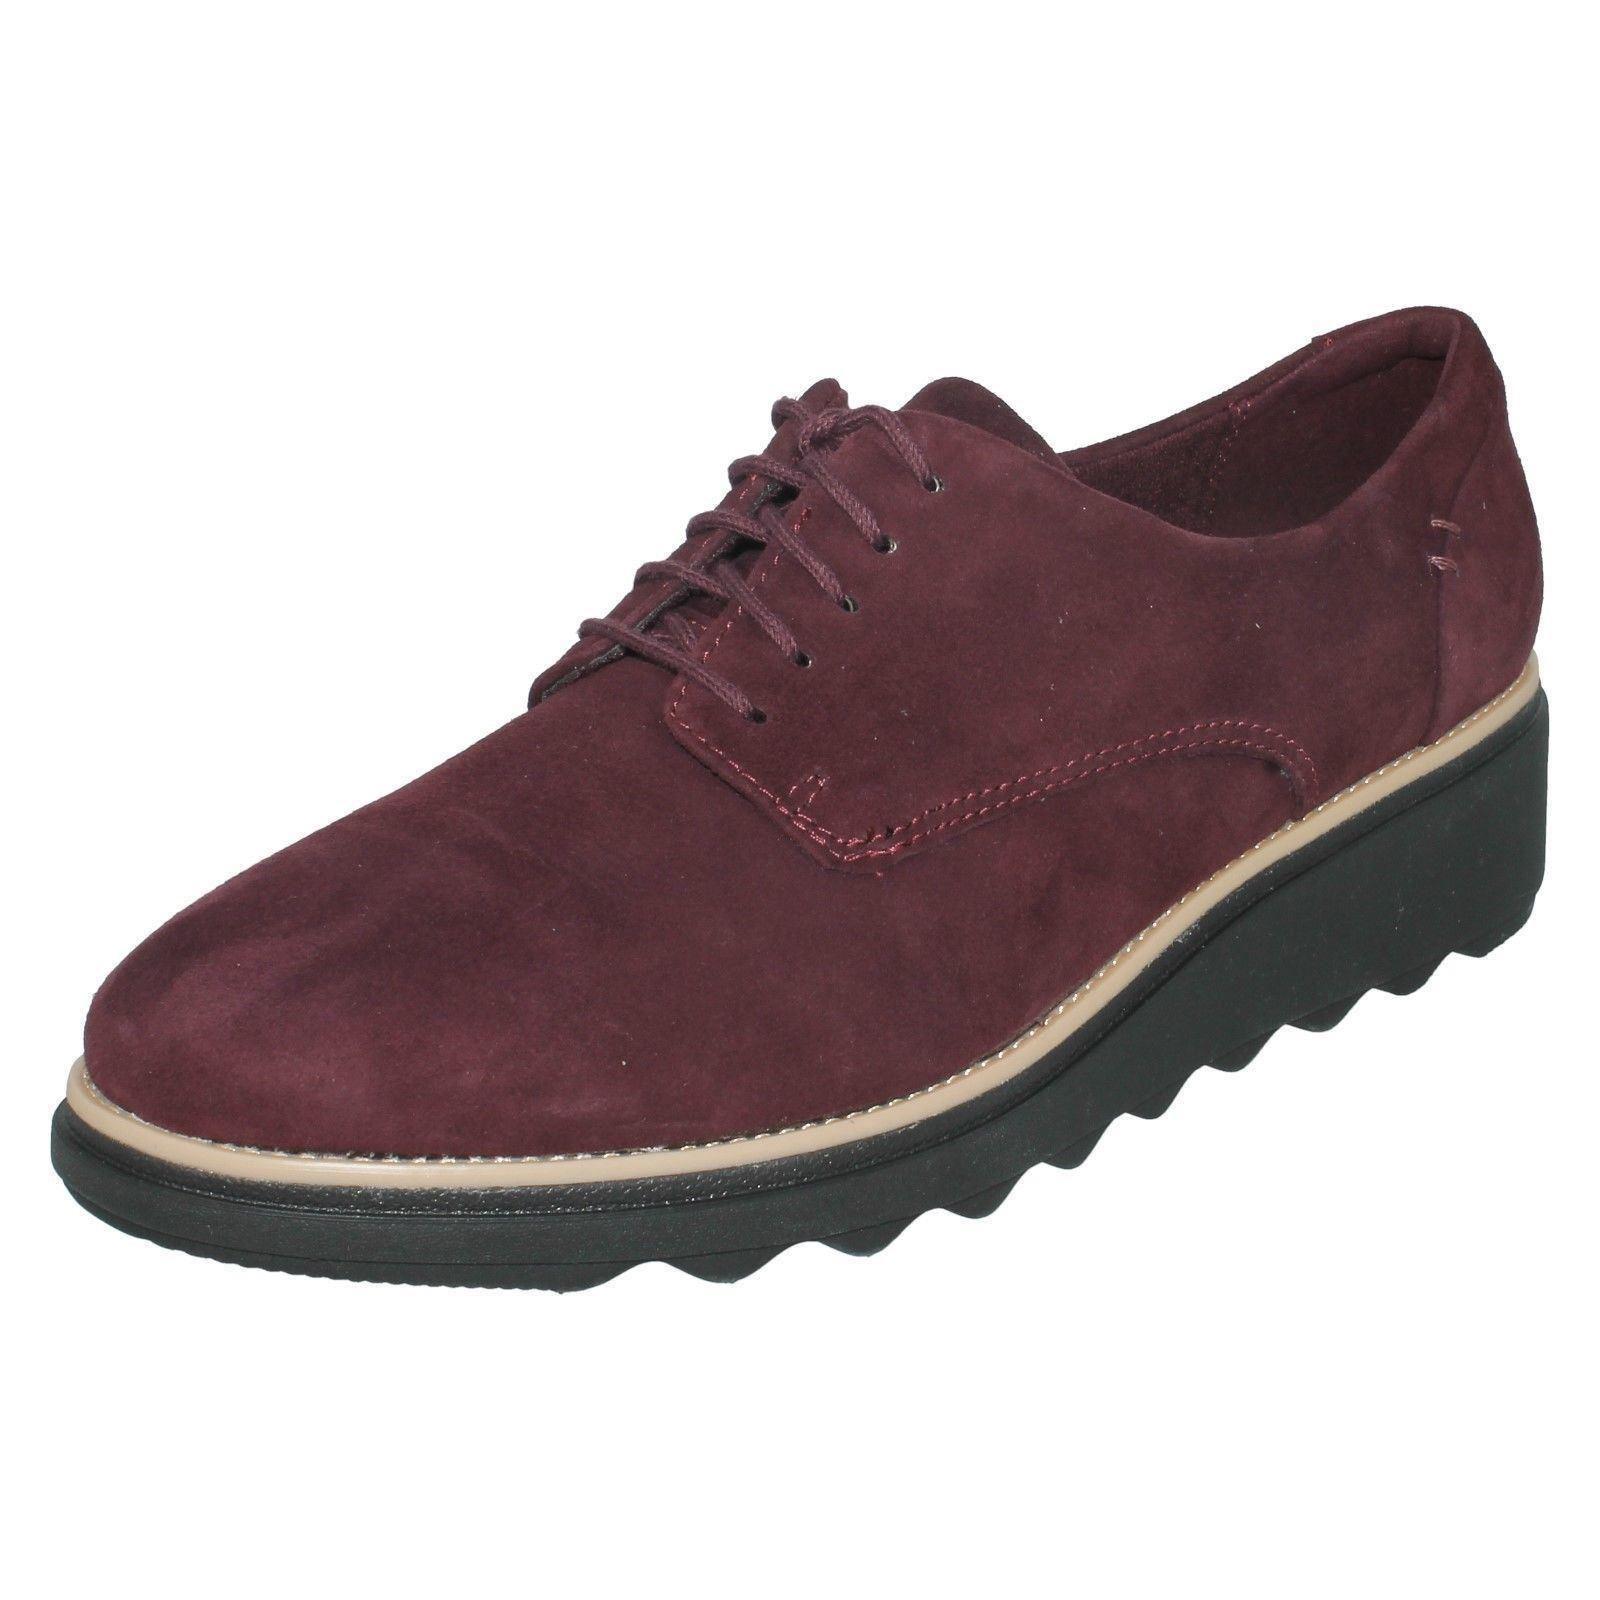 Sandalo Sandalo Sandalo Donna Clarks Con Lacci Scarpe Noel Casual in Pelle Sharon   d0b532